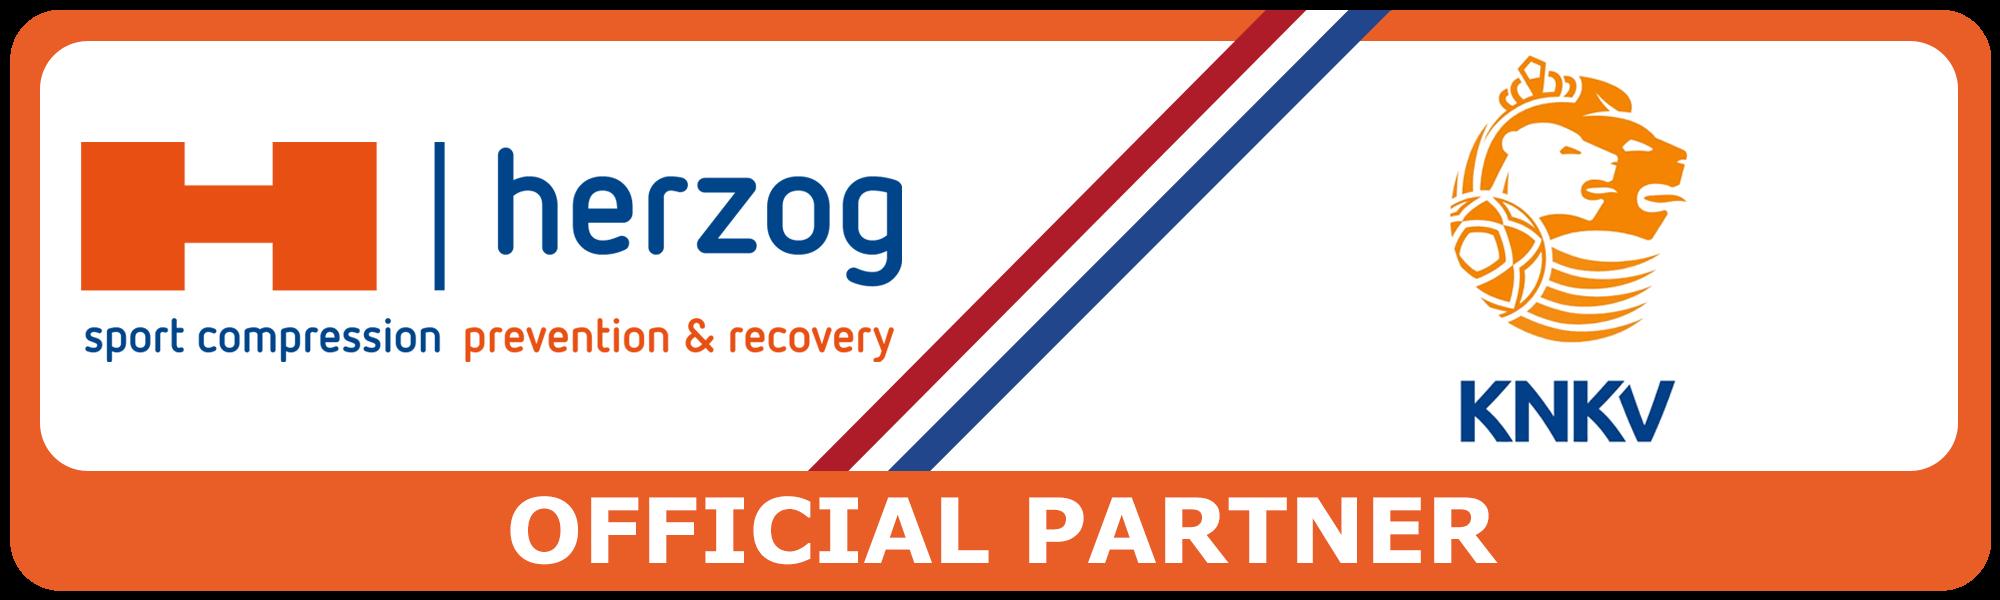 KNKV Partner logo